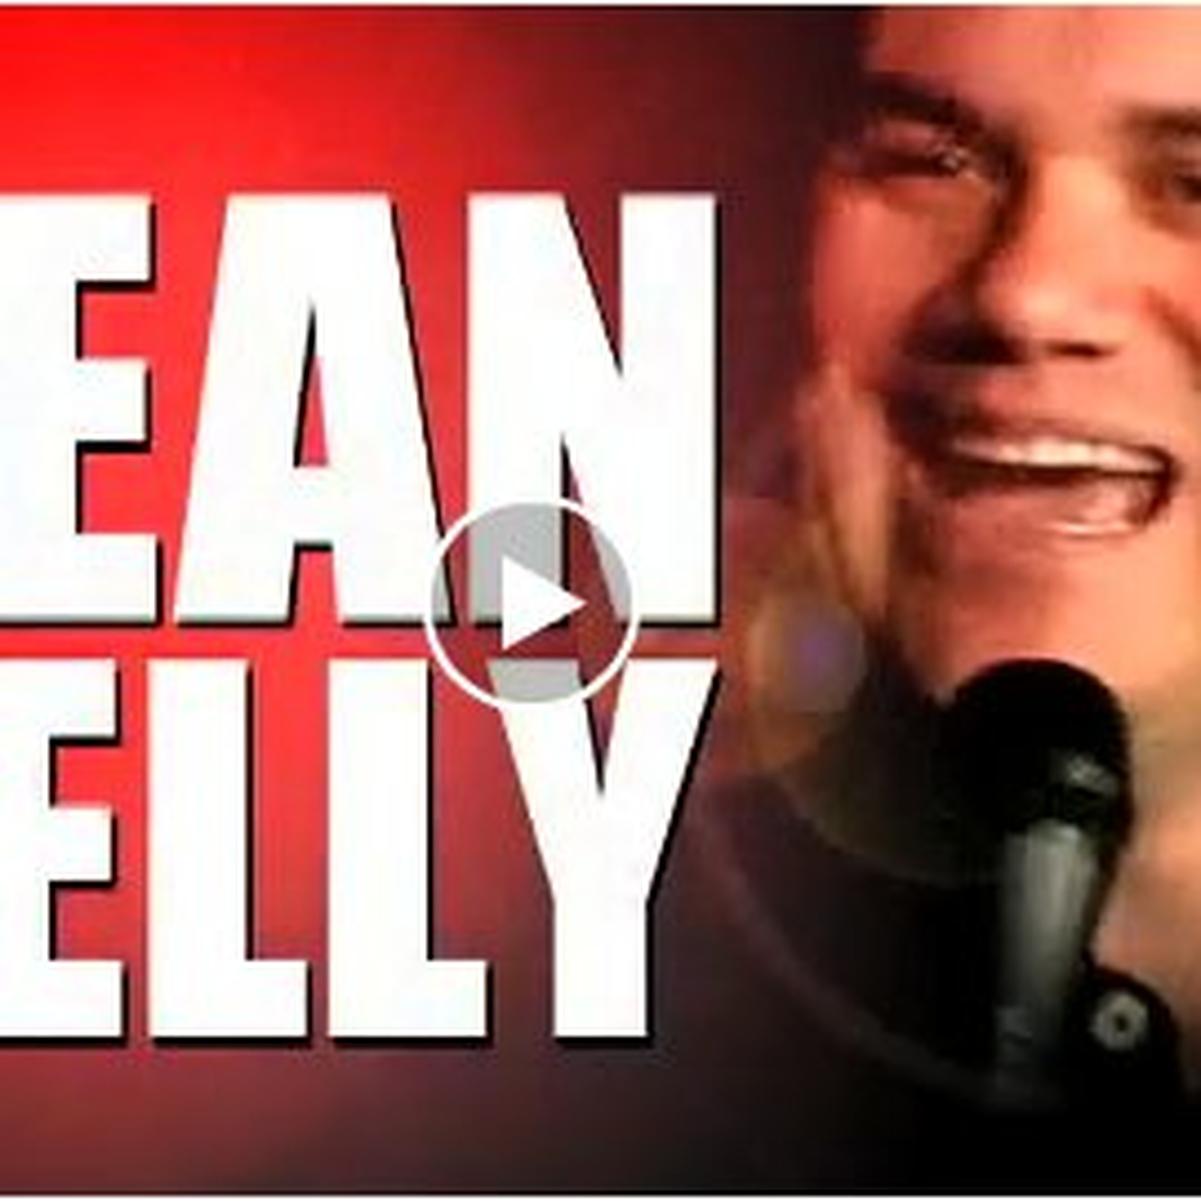 Sean Brandon Kelly